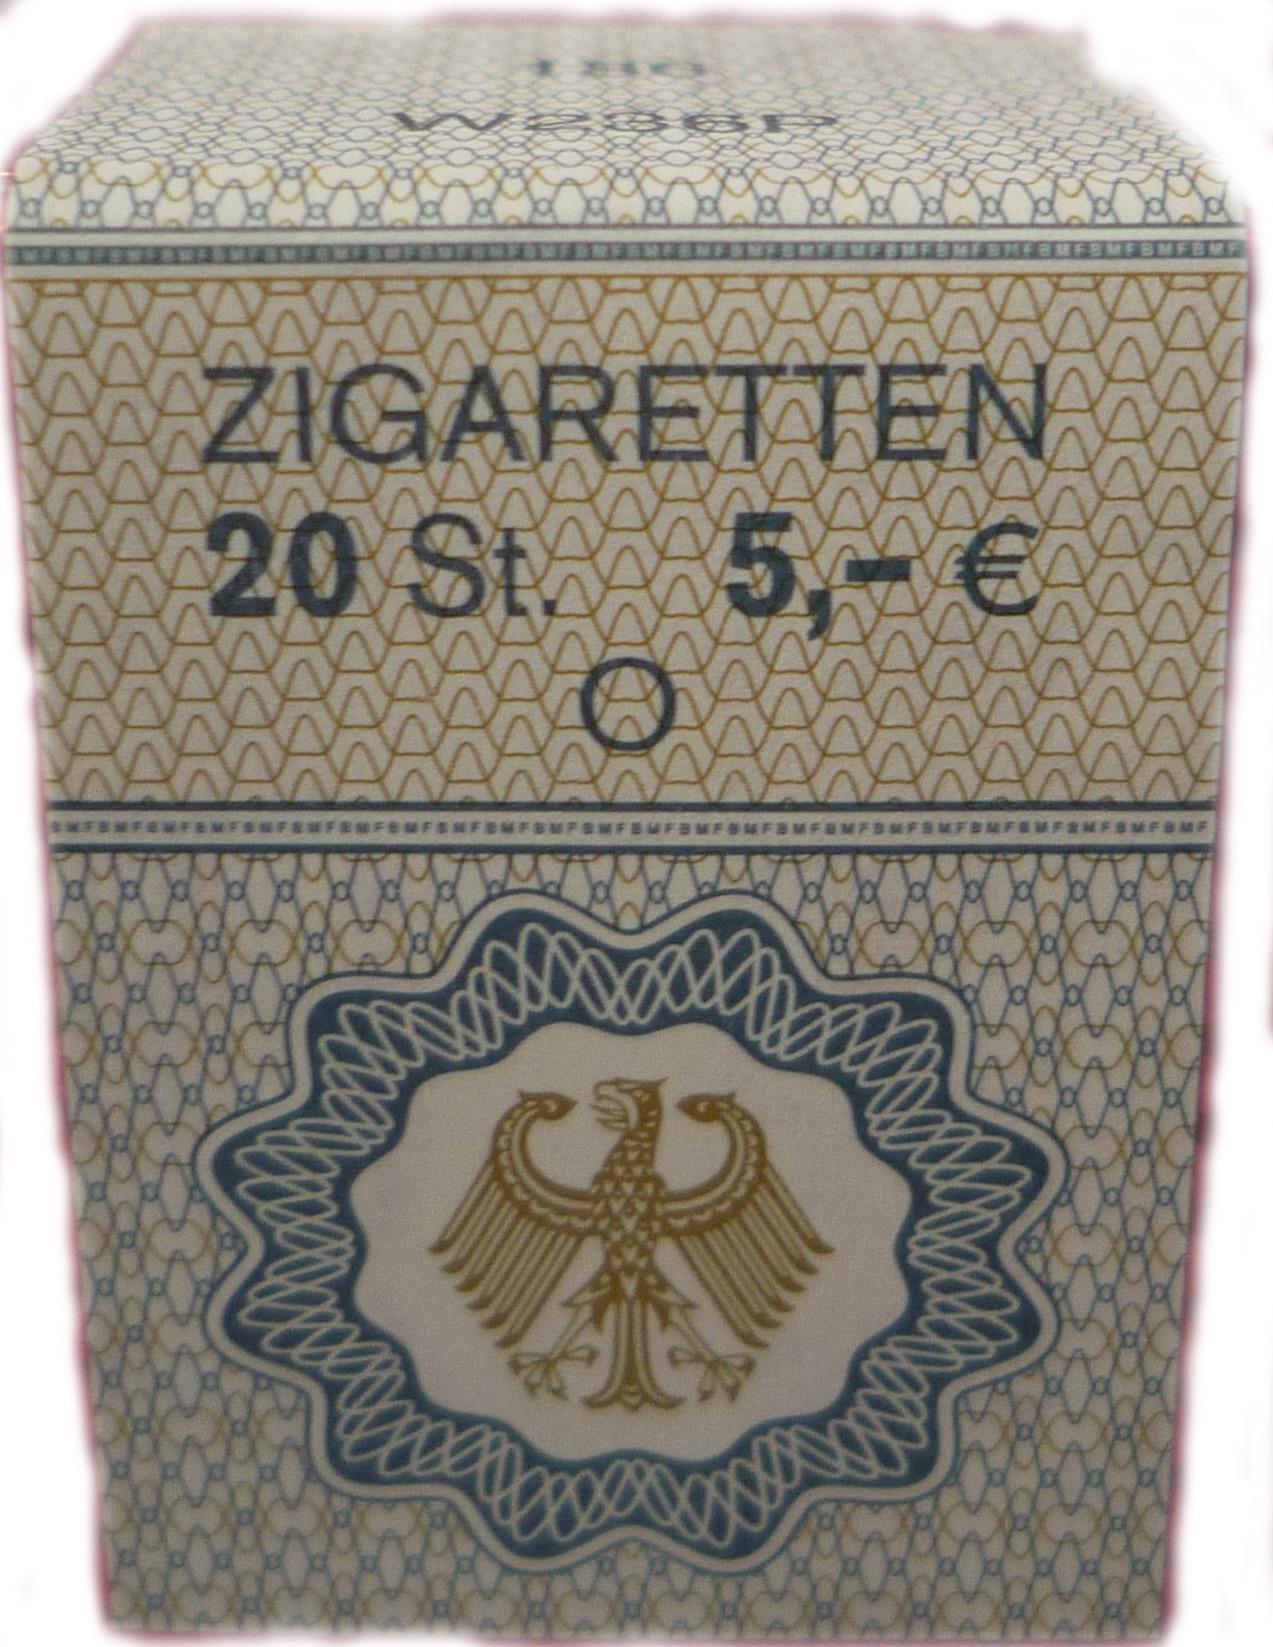 Wie viele züge pro zigarette